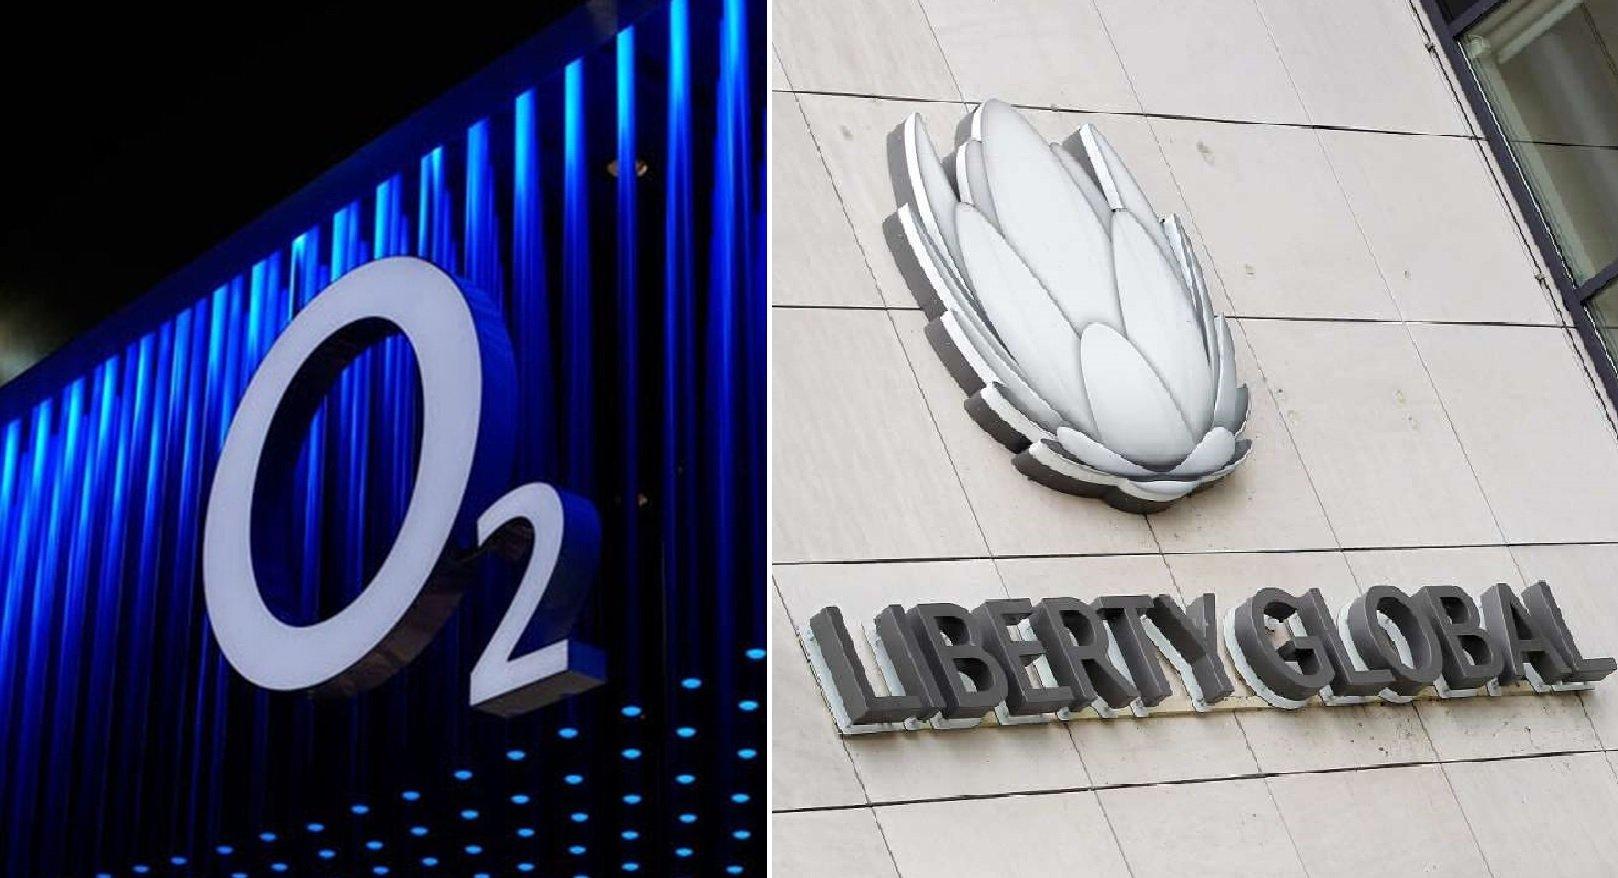 Telefónica-Liberty, en Reino Unido: unión, que no fusión, con freno y marcha atrás